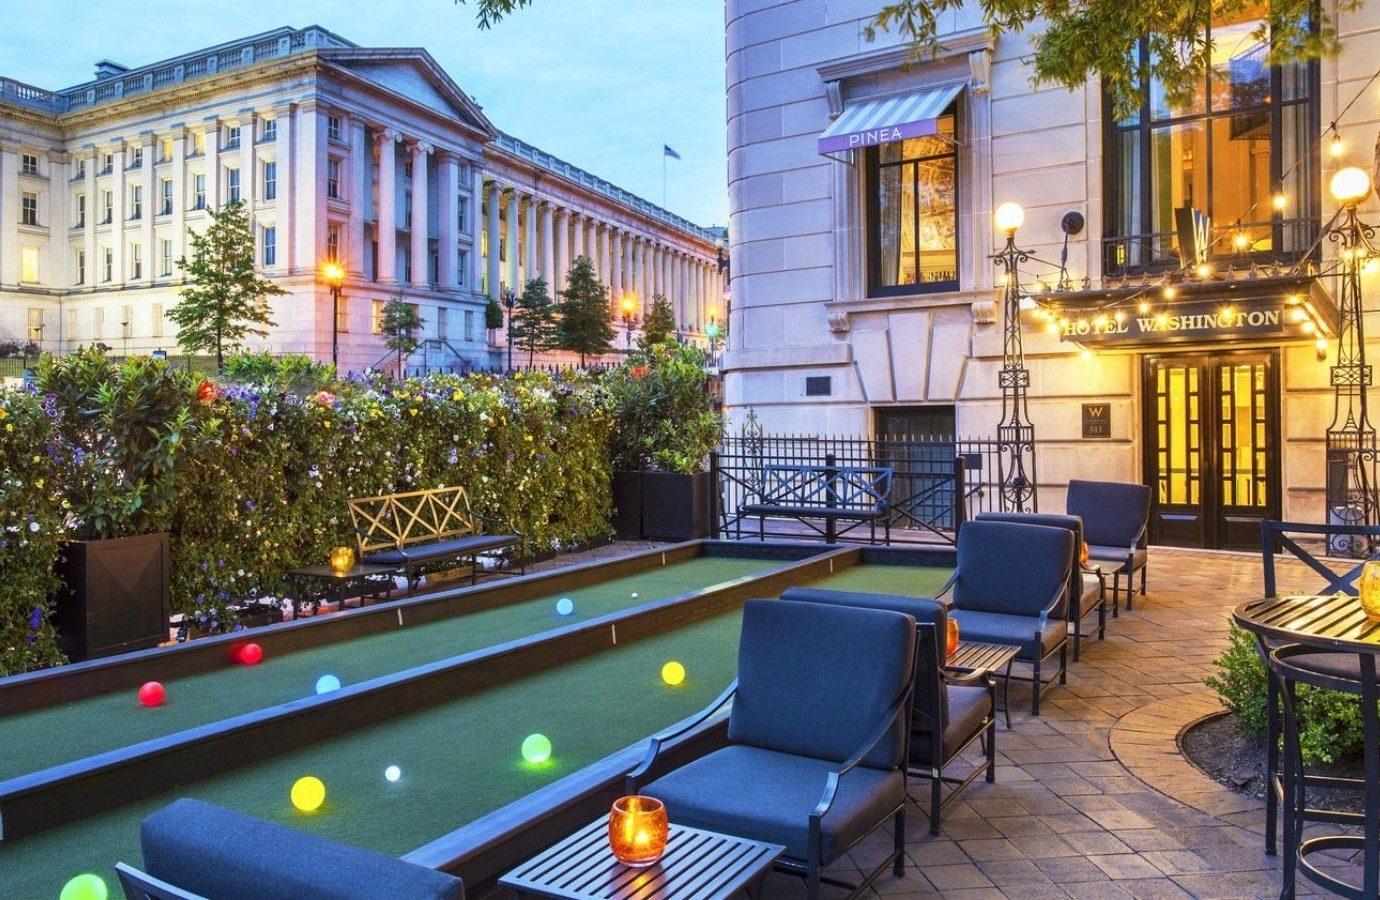 Hotels pool table property poolroom real estate leisure room